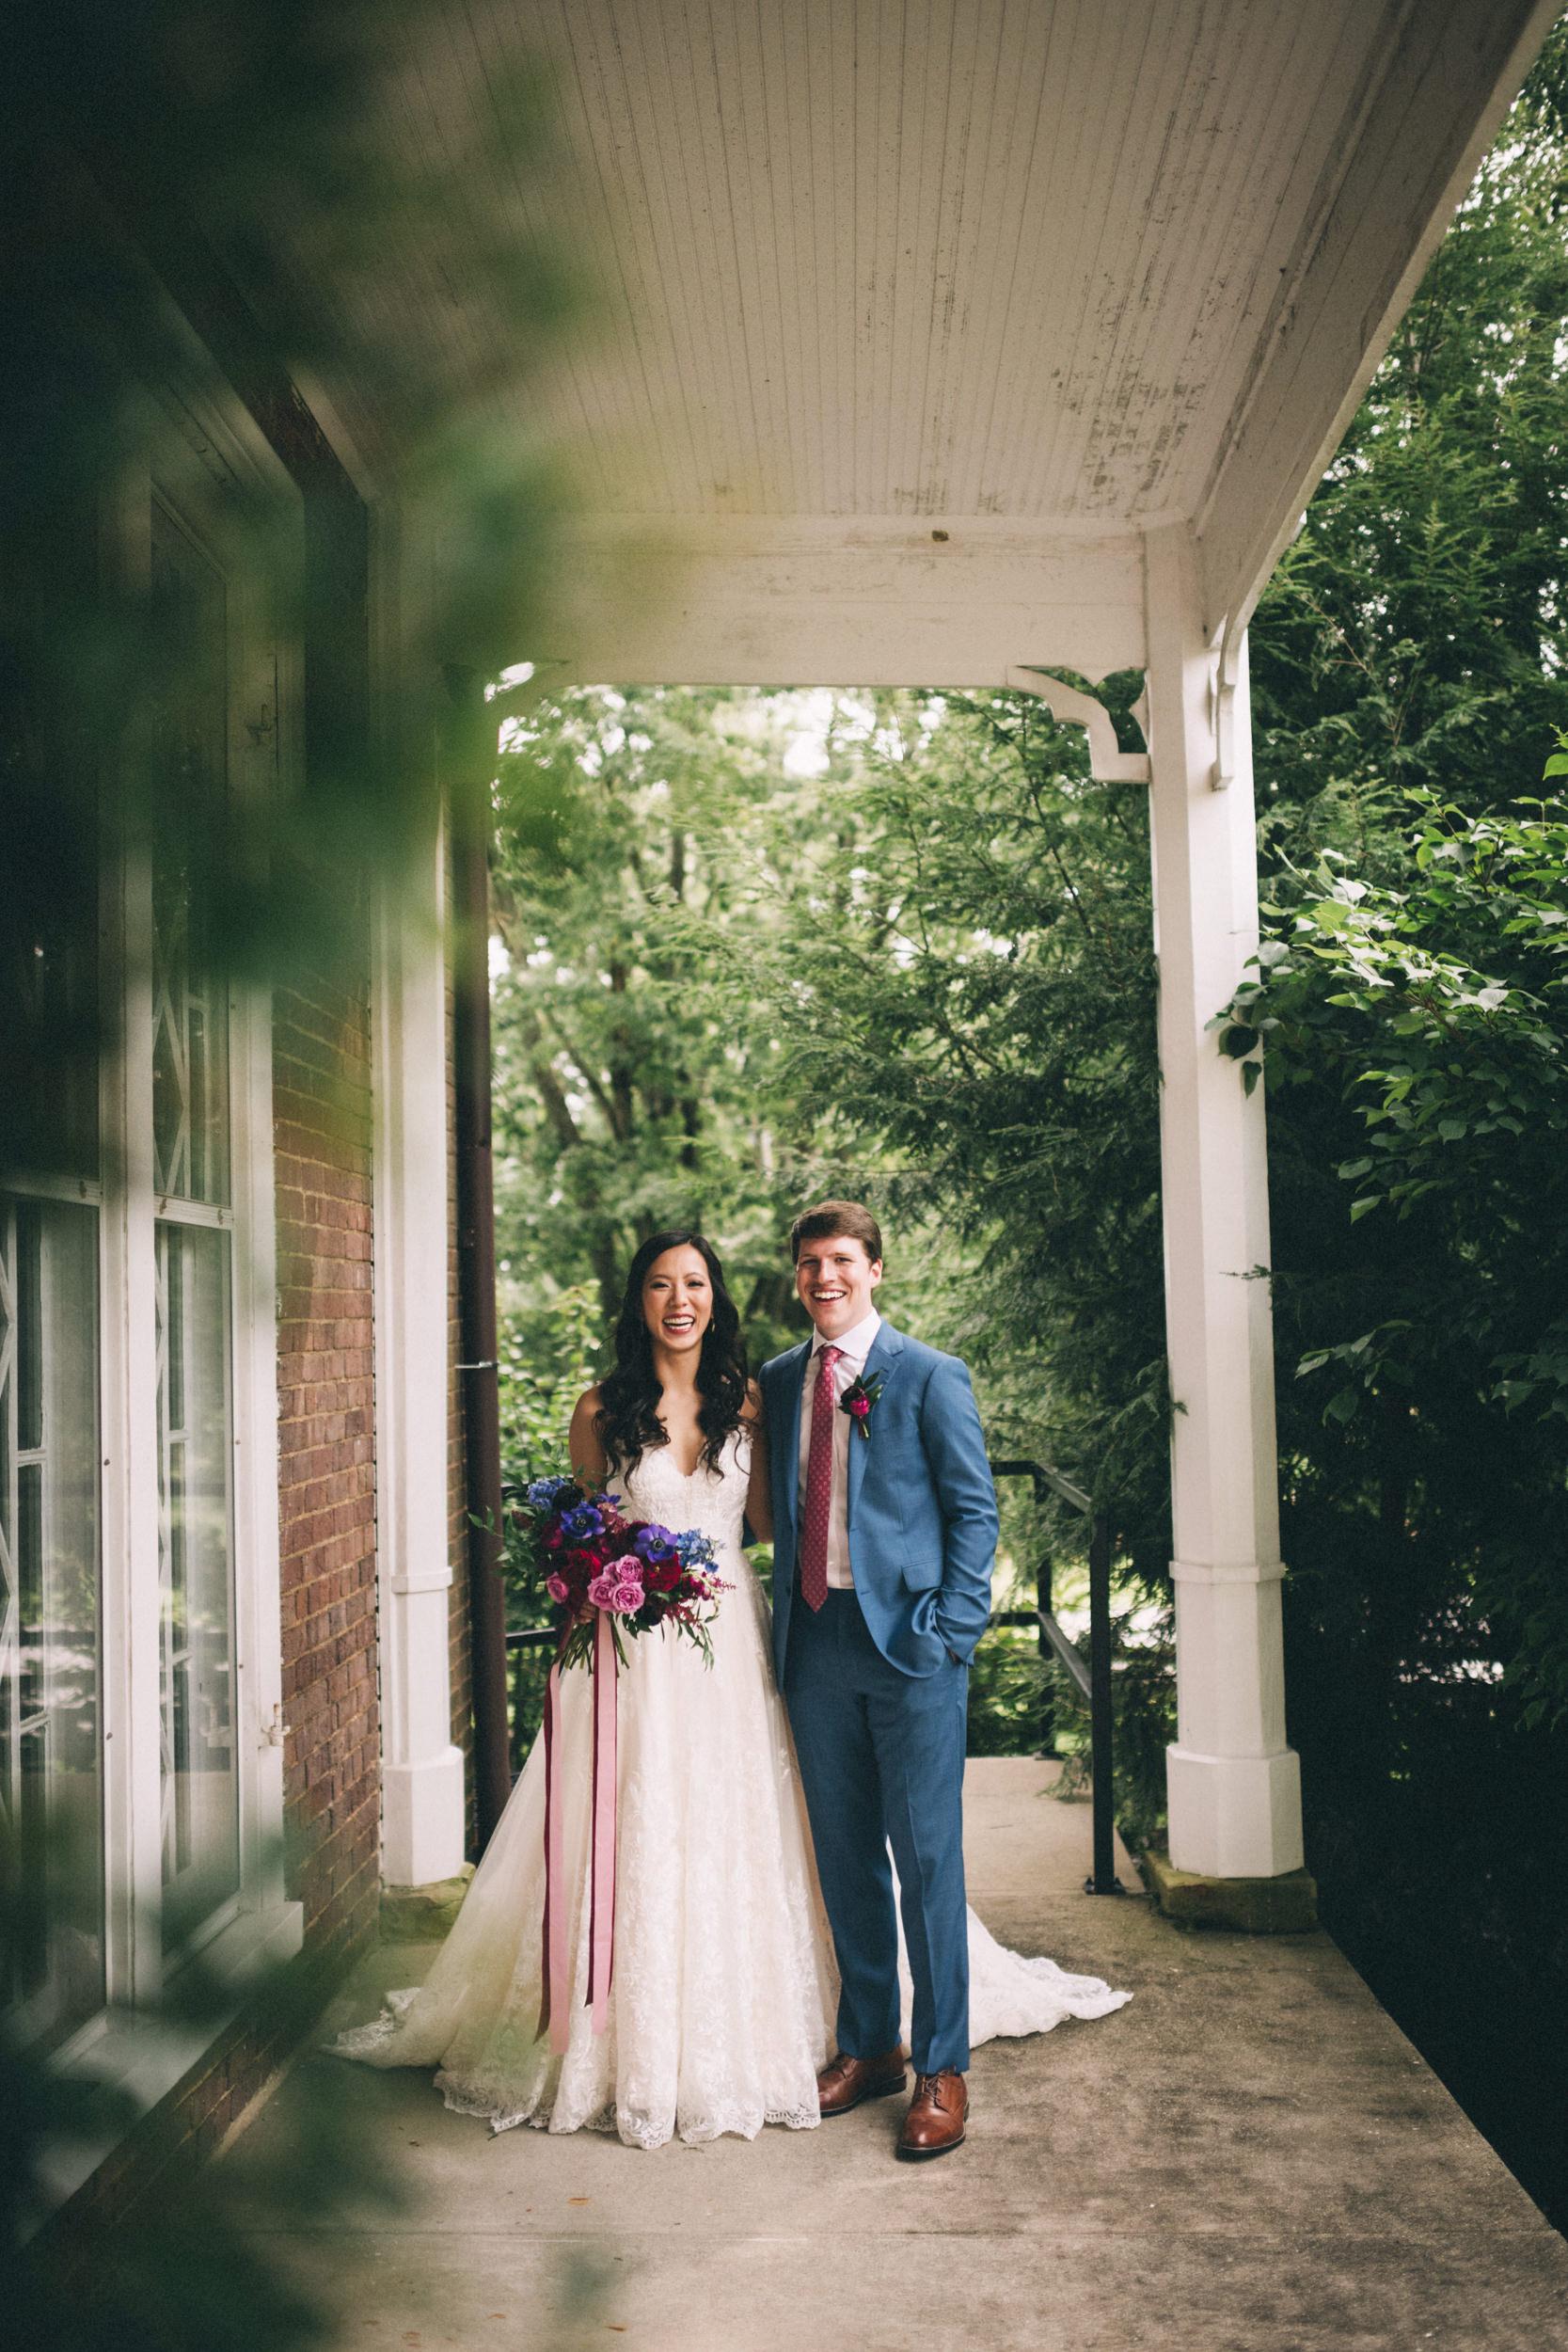 Louisville-Kentucky-Wedding-and-Elopement-Photographer-Sarah-Katherine-Davis-Photography-Summer-Jewel-Toned-Wedding-Chineese-Tea-Ceremony-Warrenwood-Manor-Danville-202.jpg